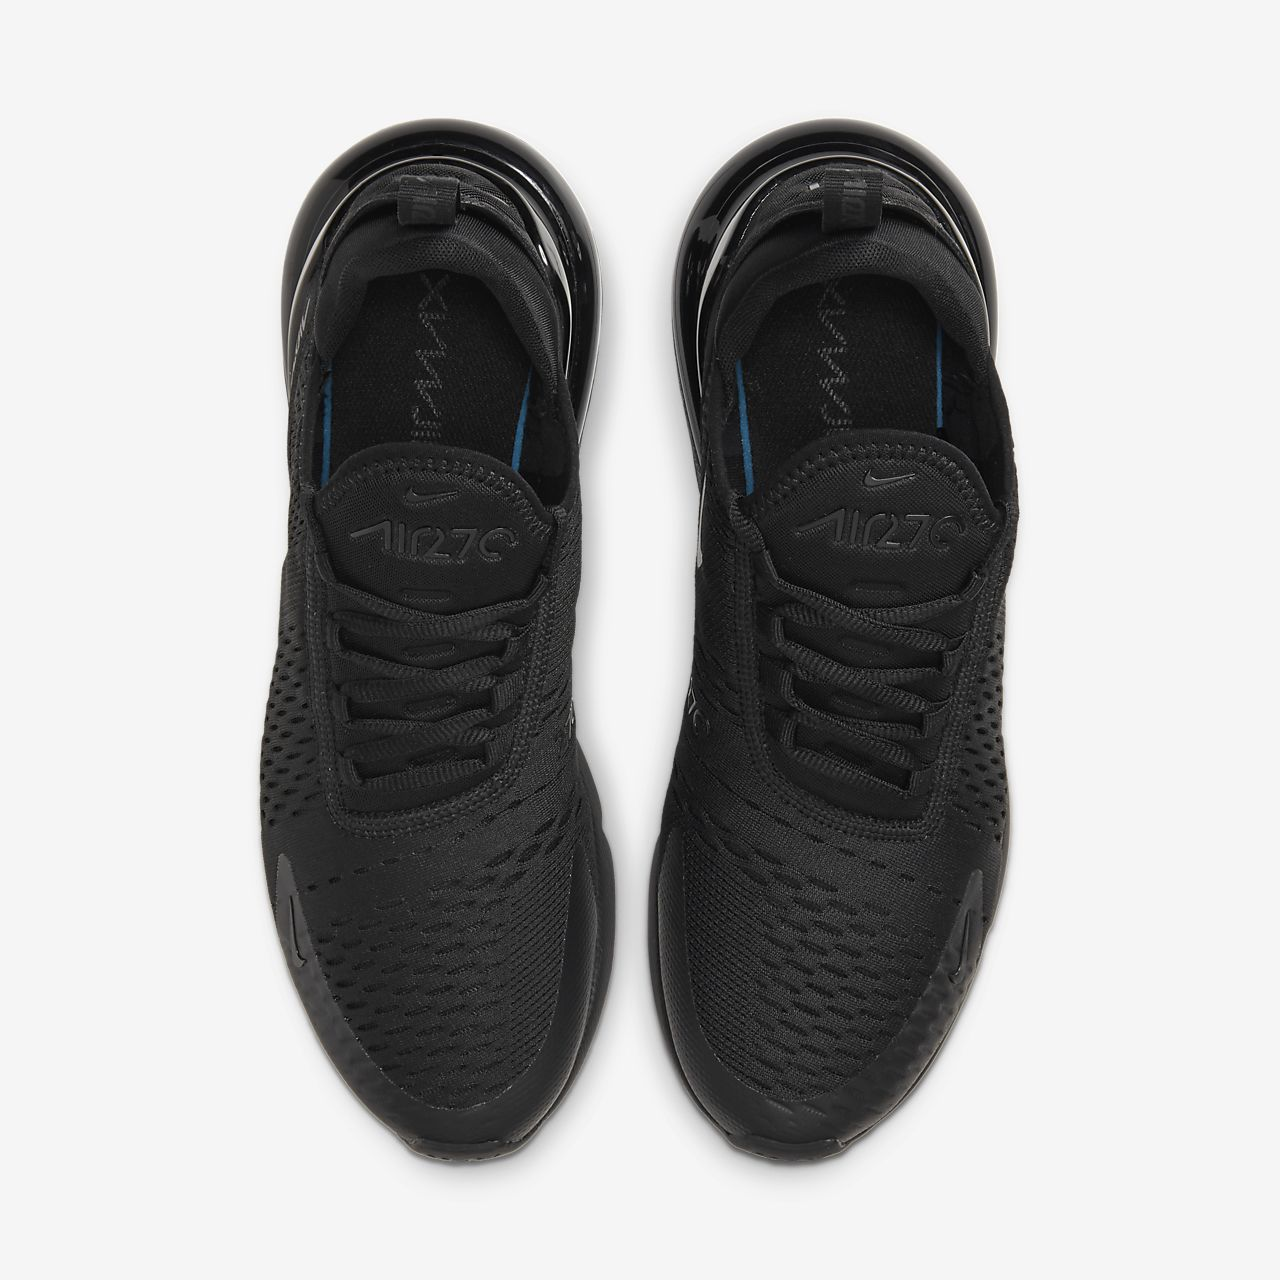 brand new 6ee2e dfb6f ... Мужские кроссовки Nike Air Max 270